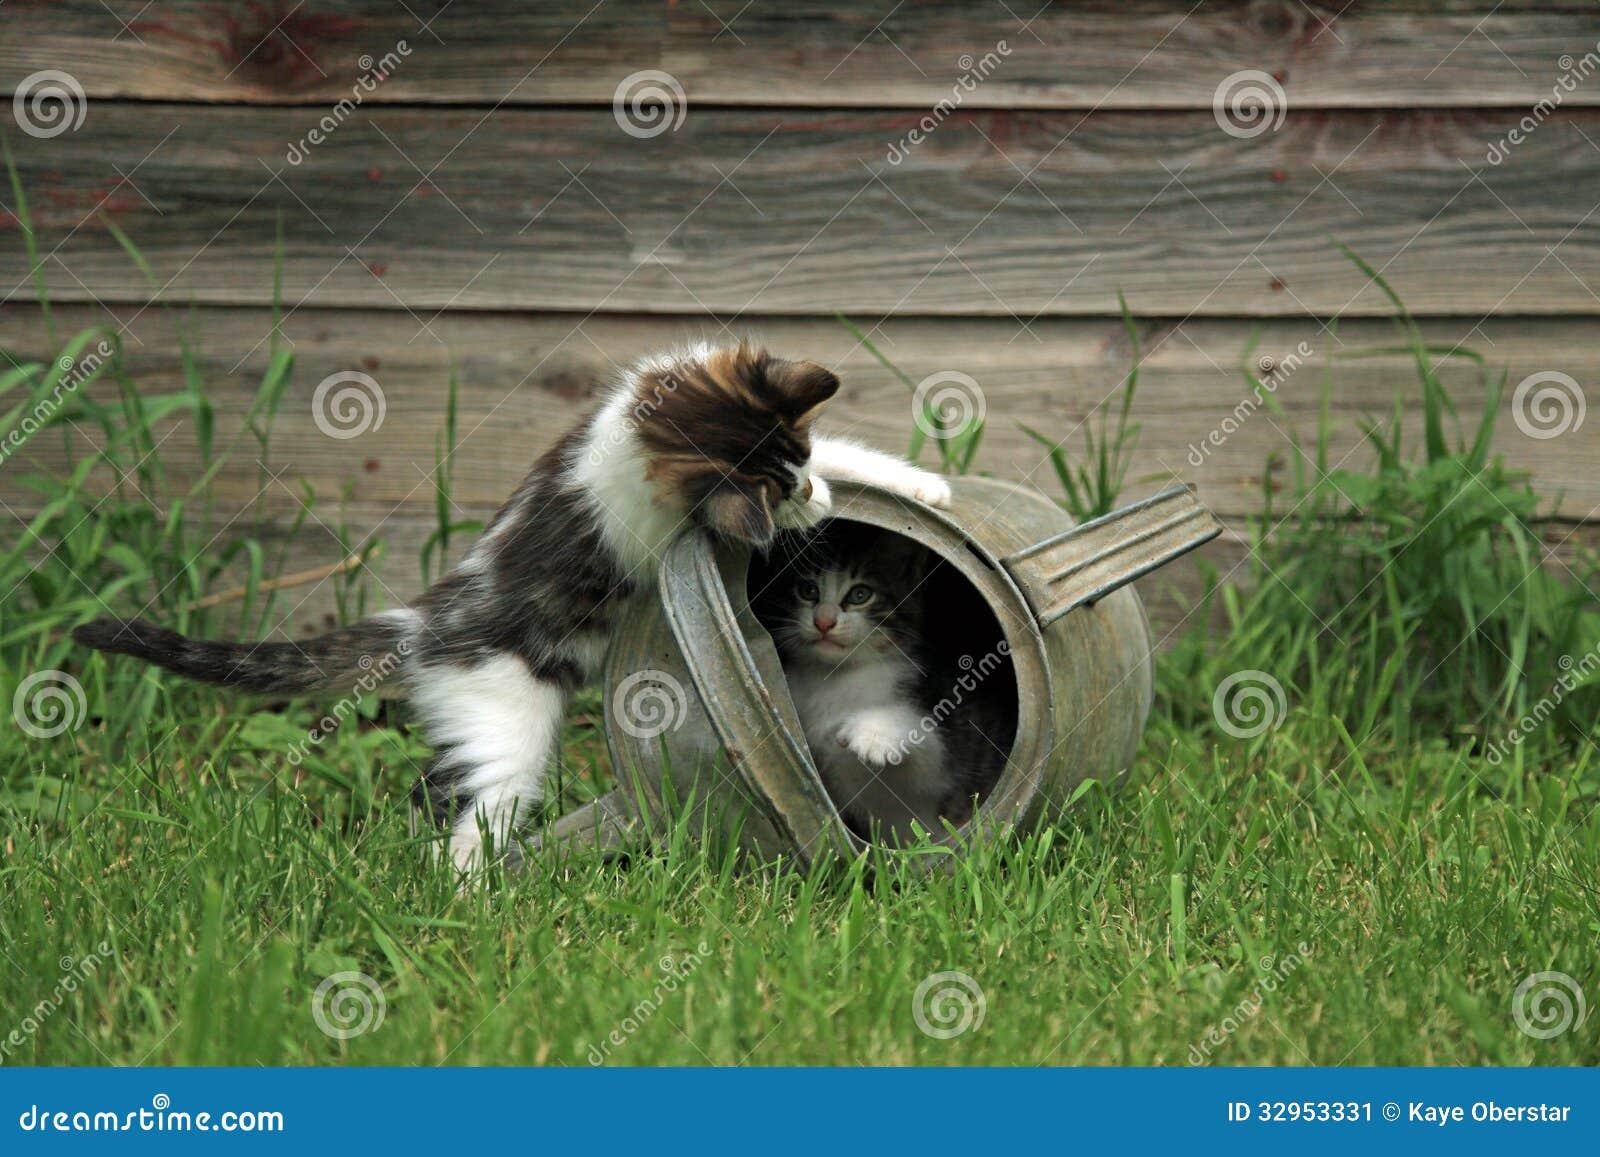 Kittens playing peek a boo